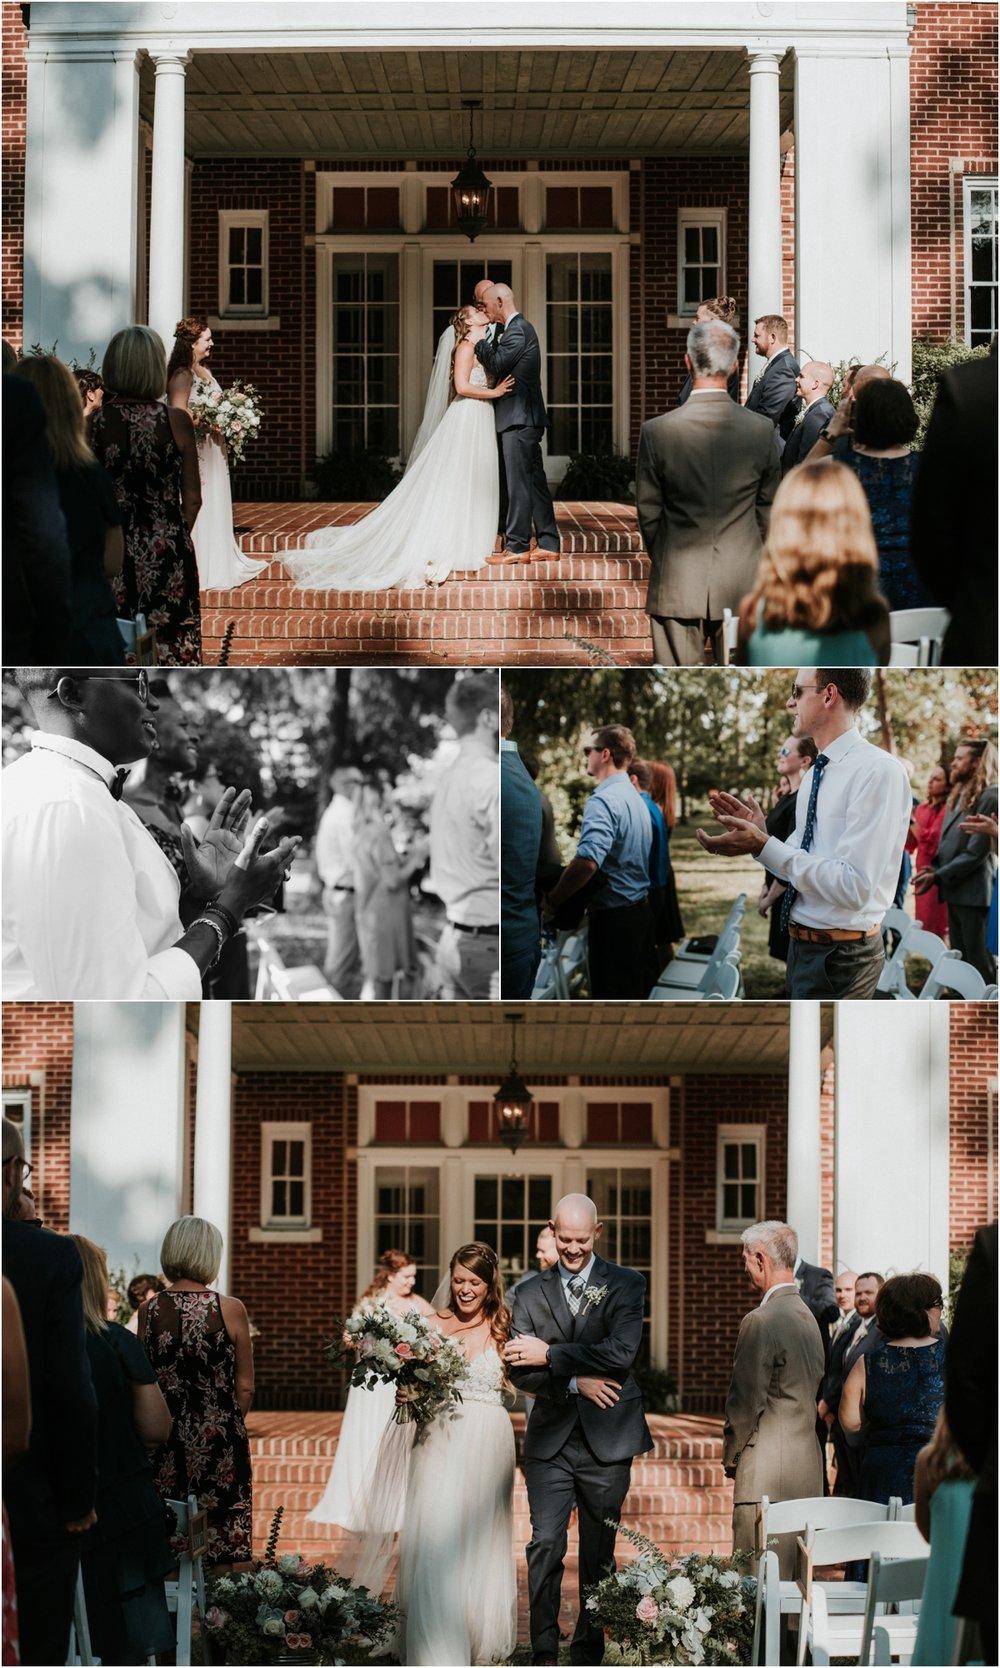 Stowe-manor-wedding-belmont-nc_0034.jpg